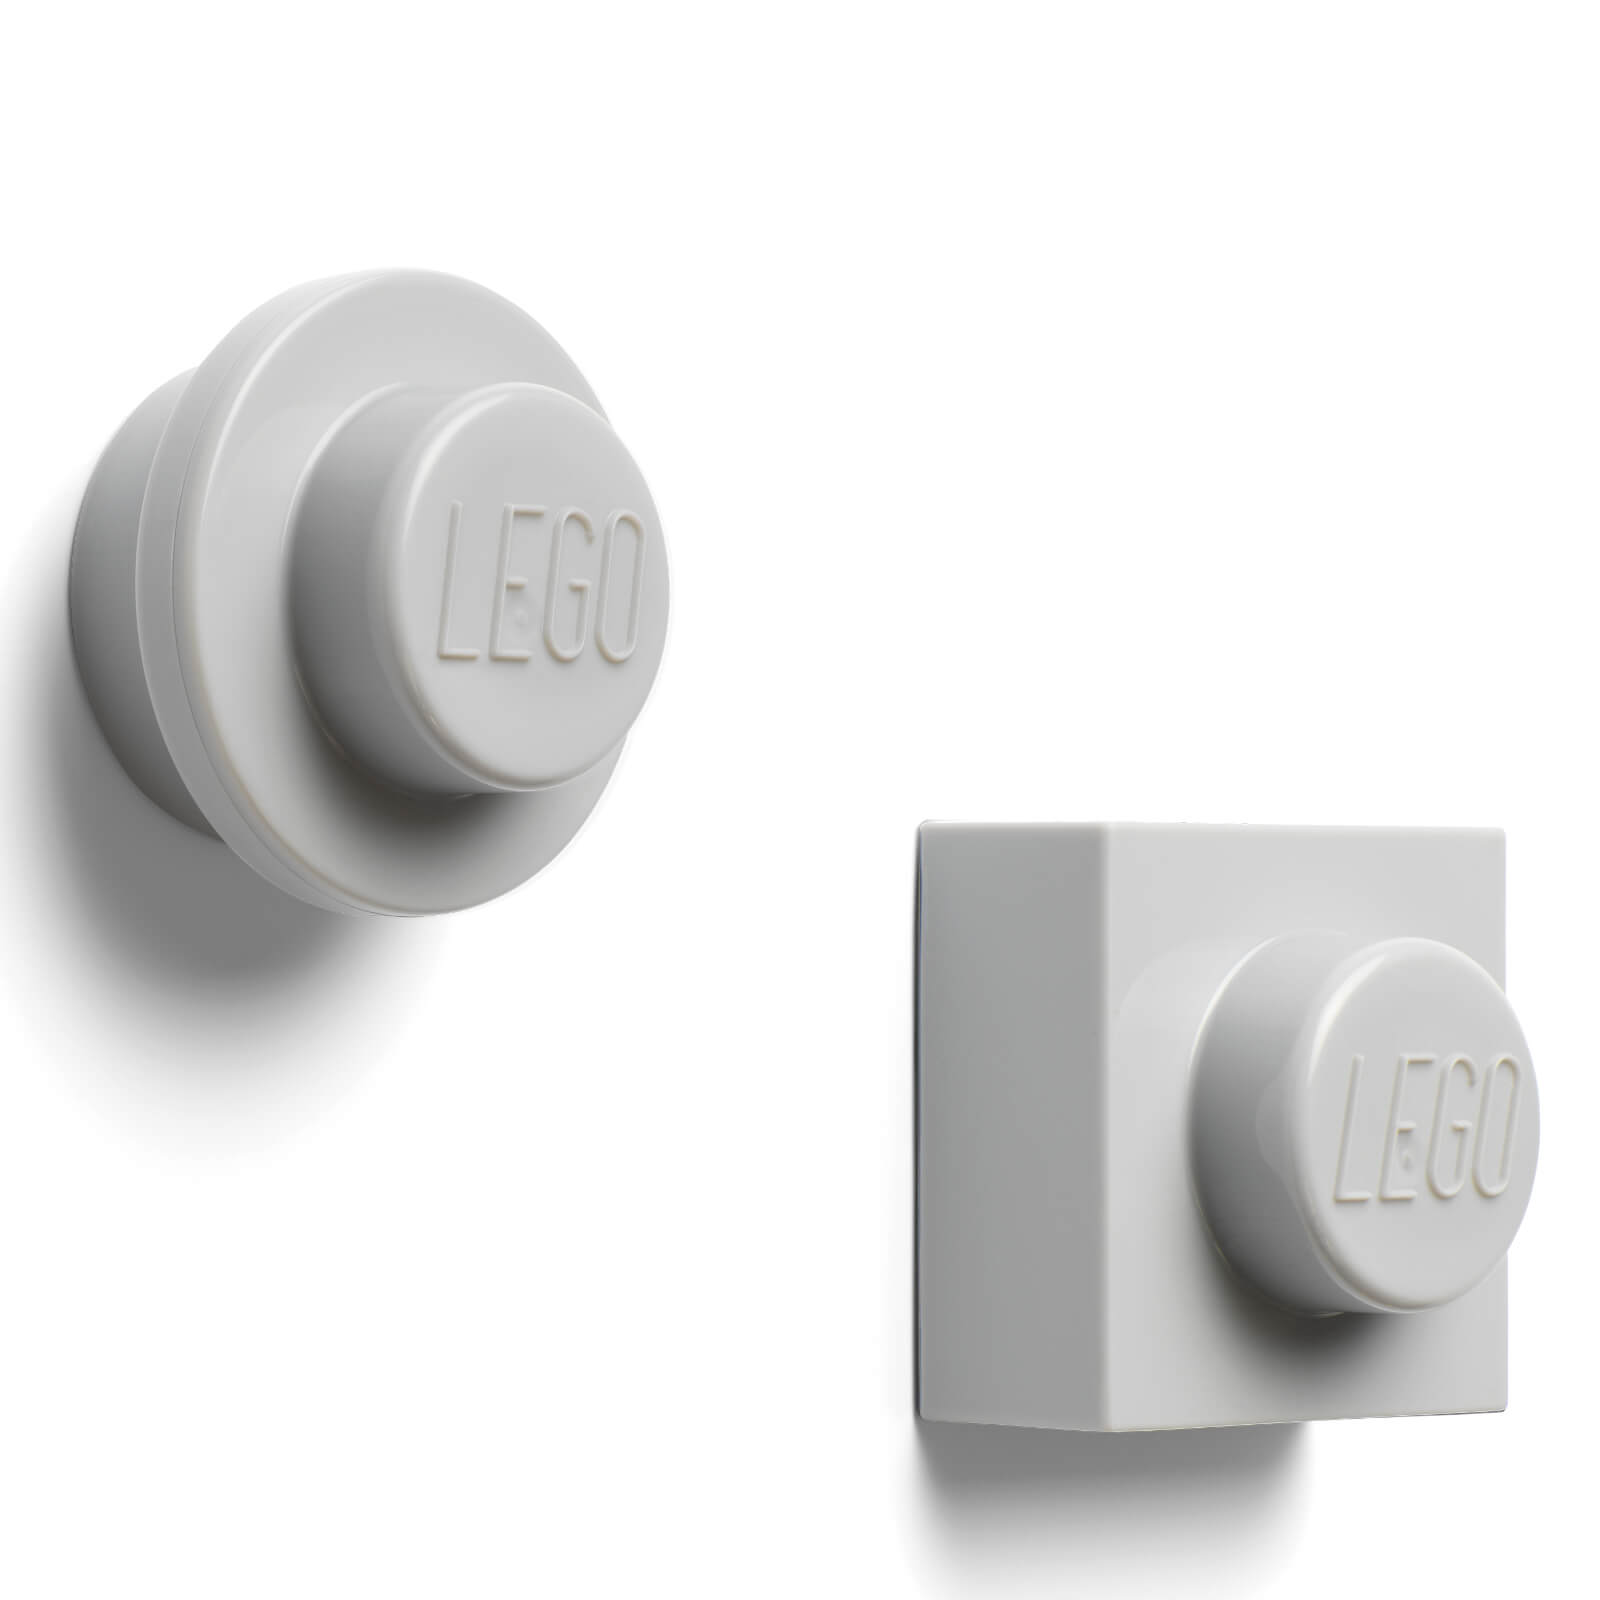 LEGO Magnet Set   Grey